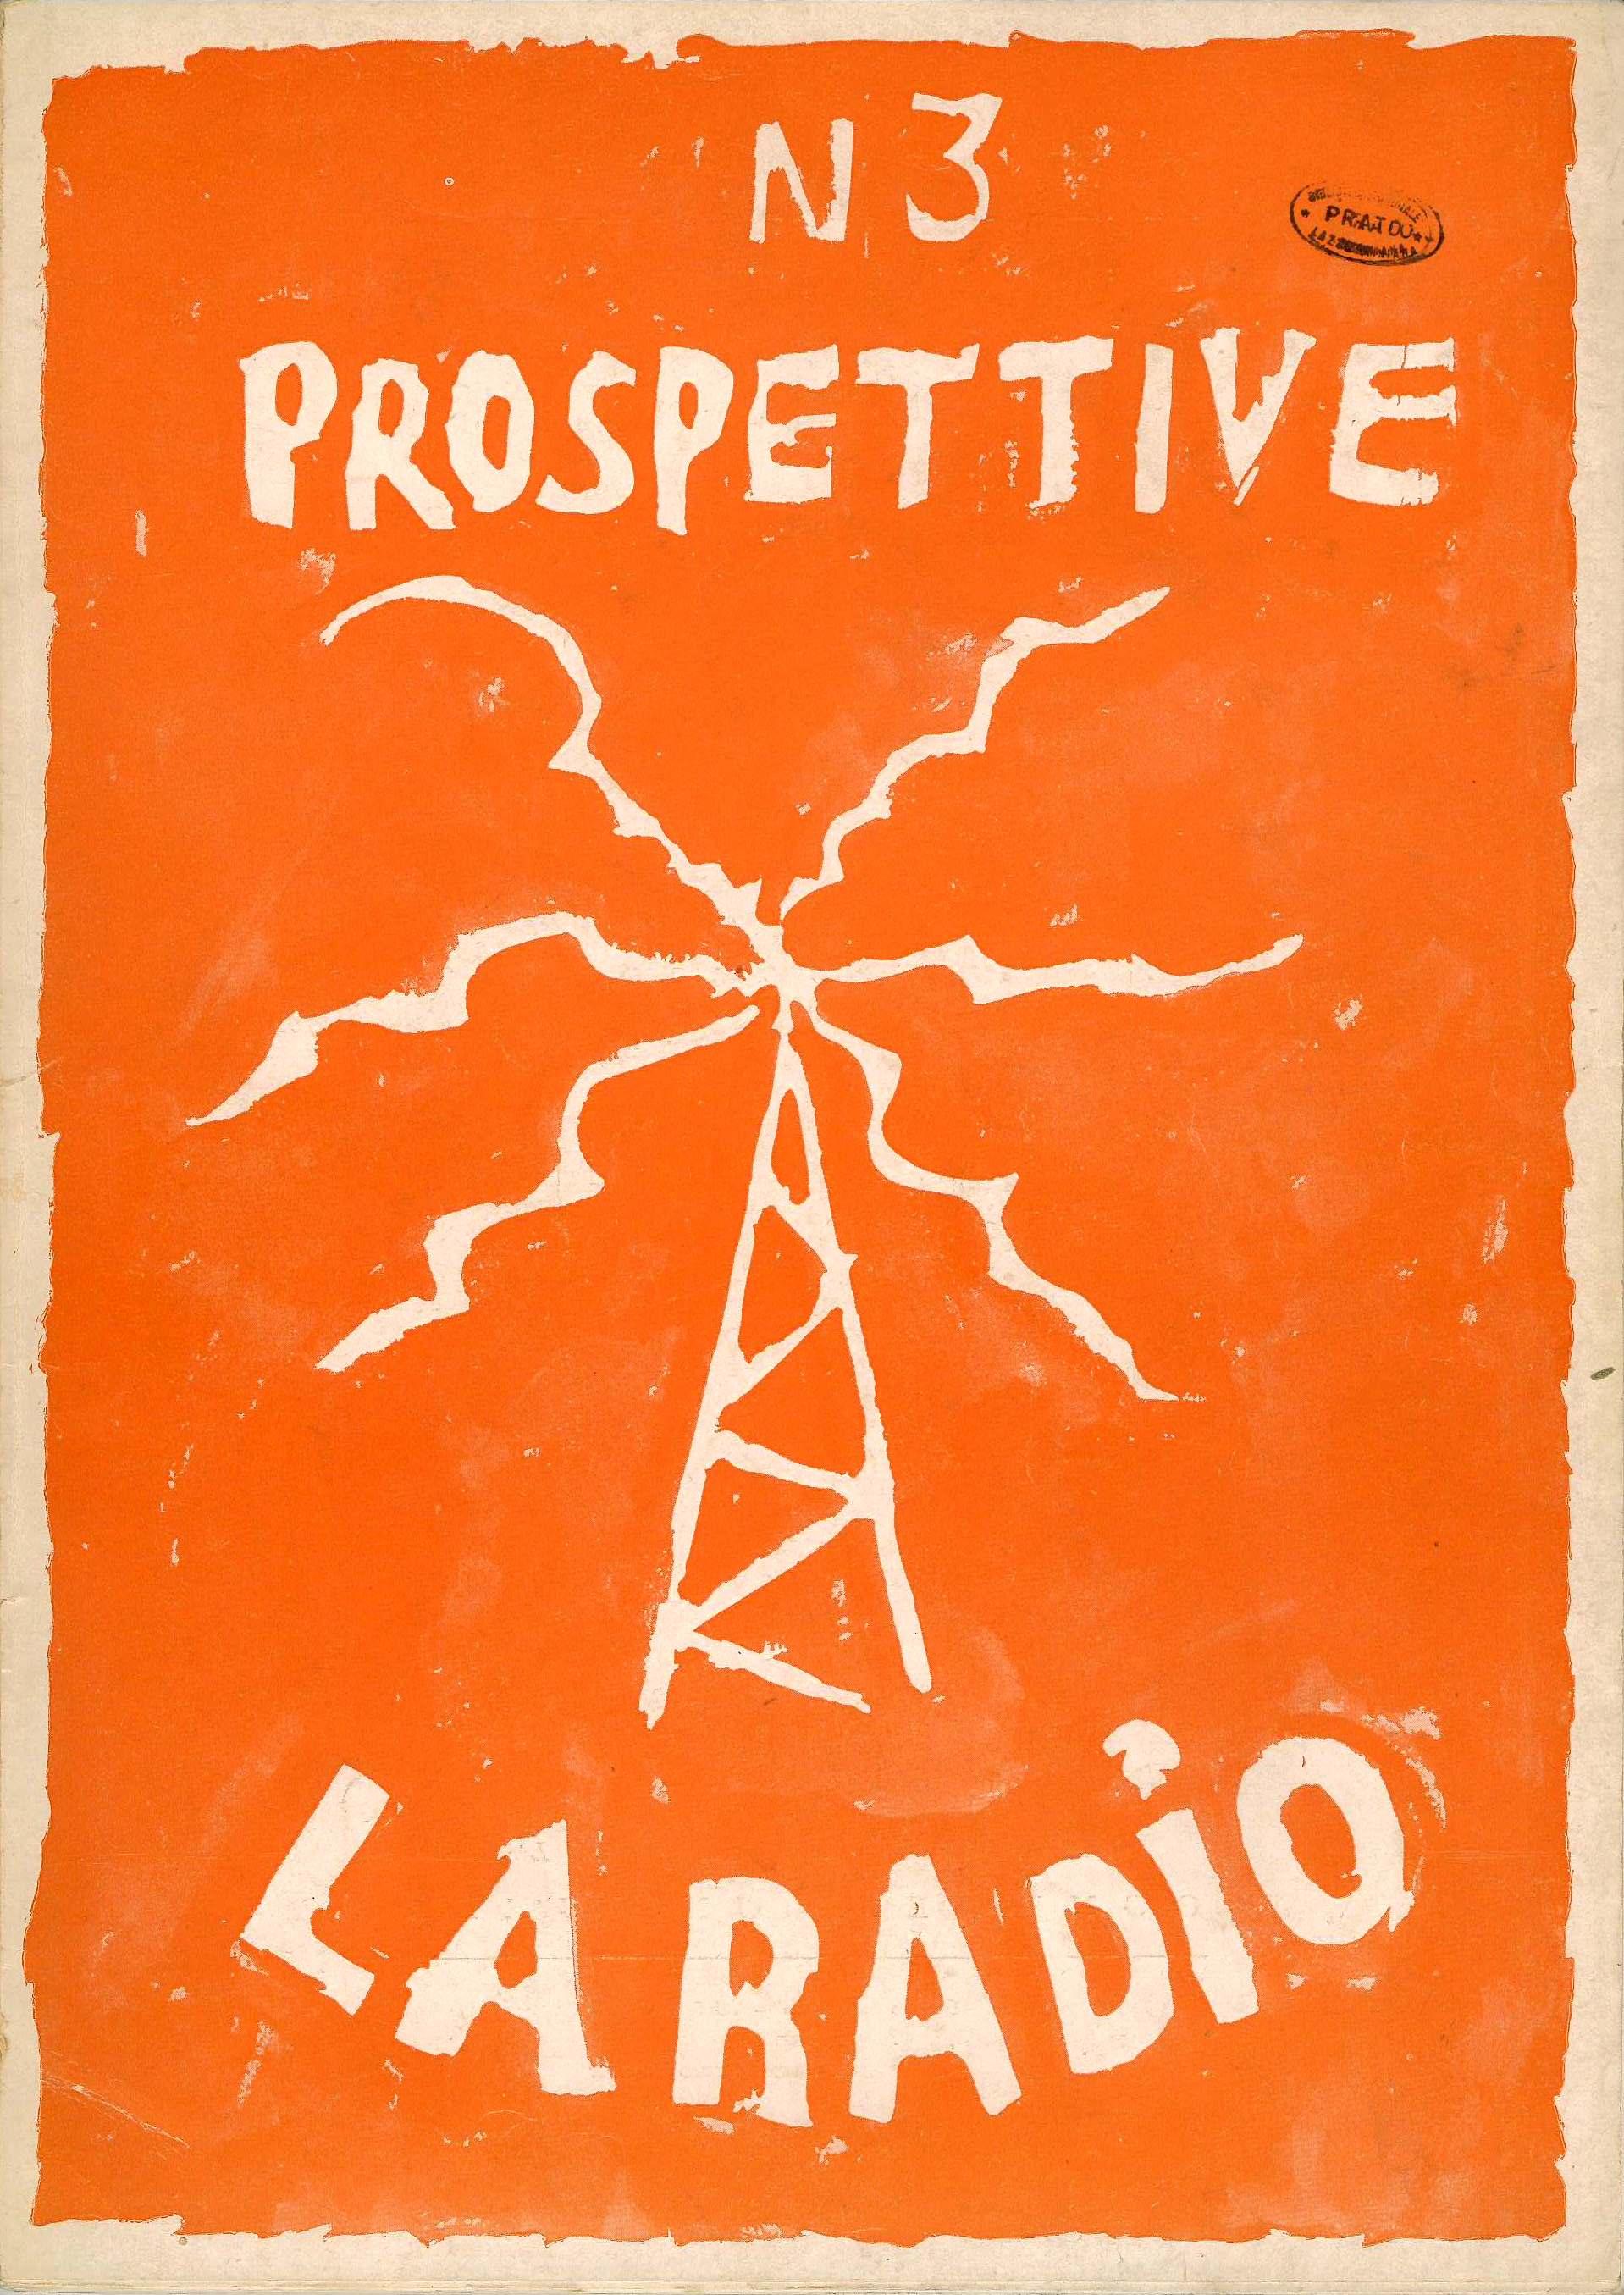 06. La radio du 'consensus'